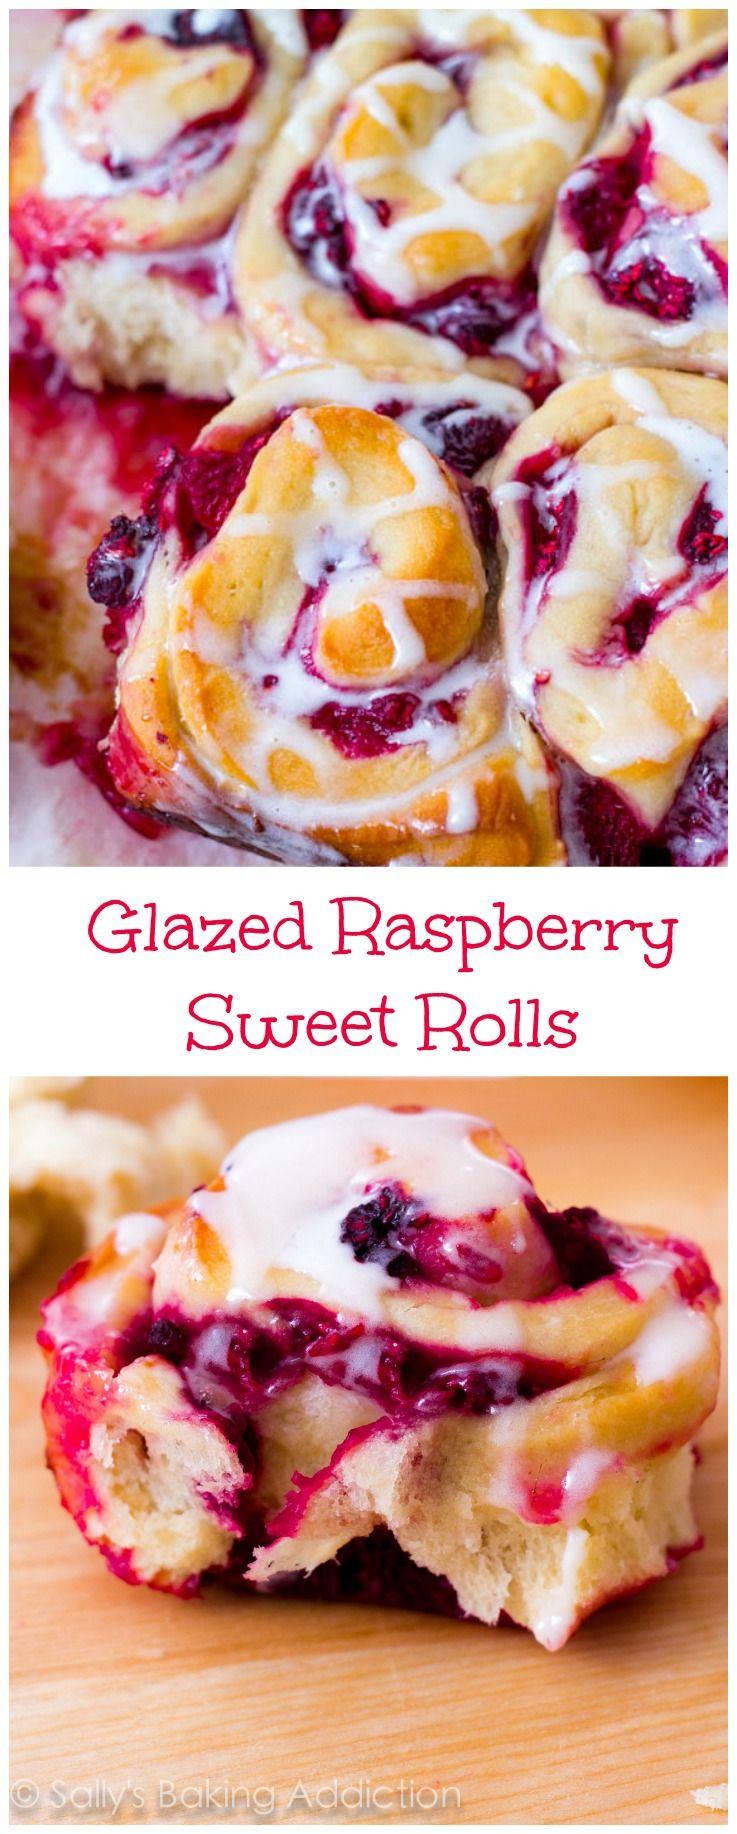 Glazed Raspberry Sweet Rolls A Delicious Twist On